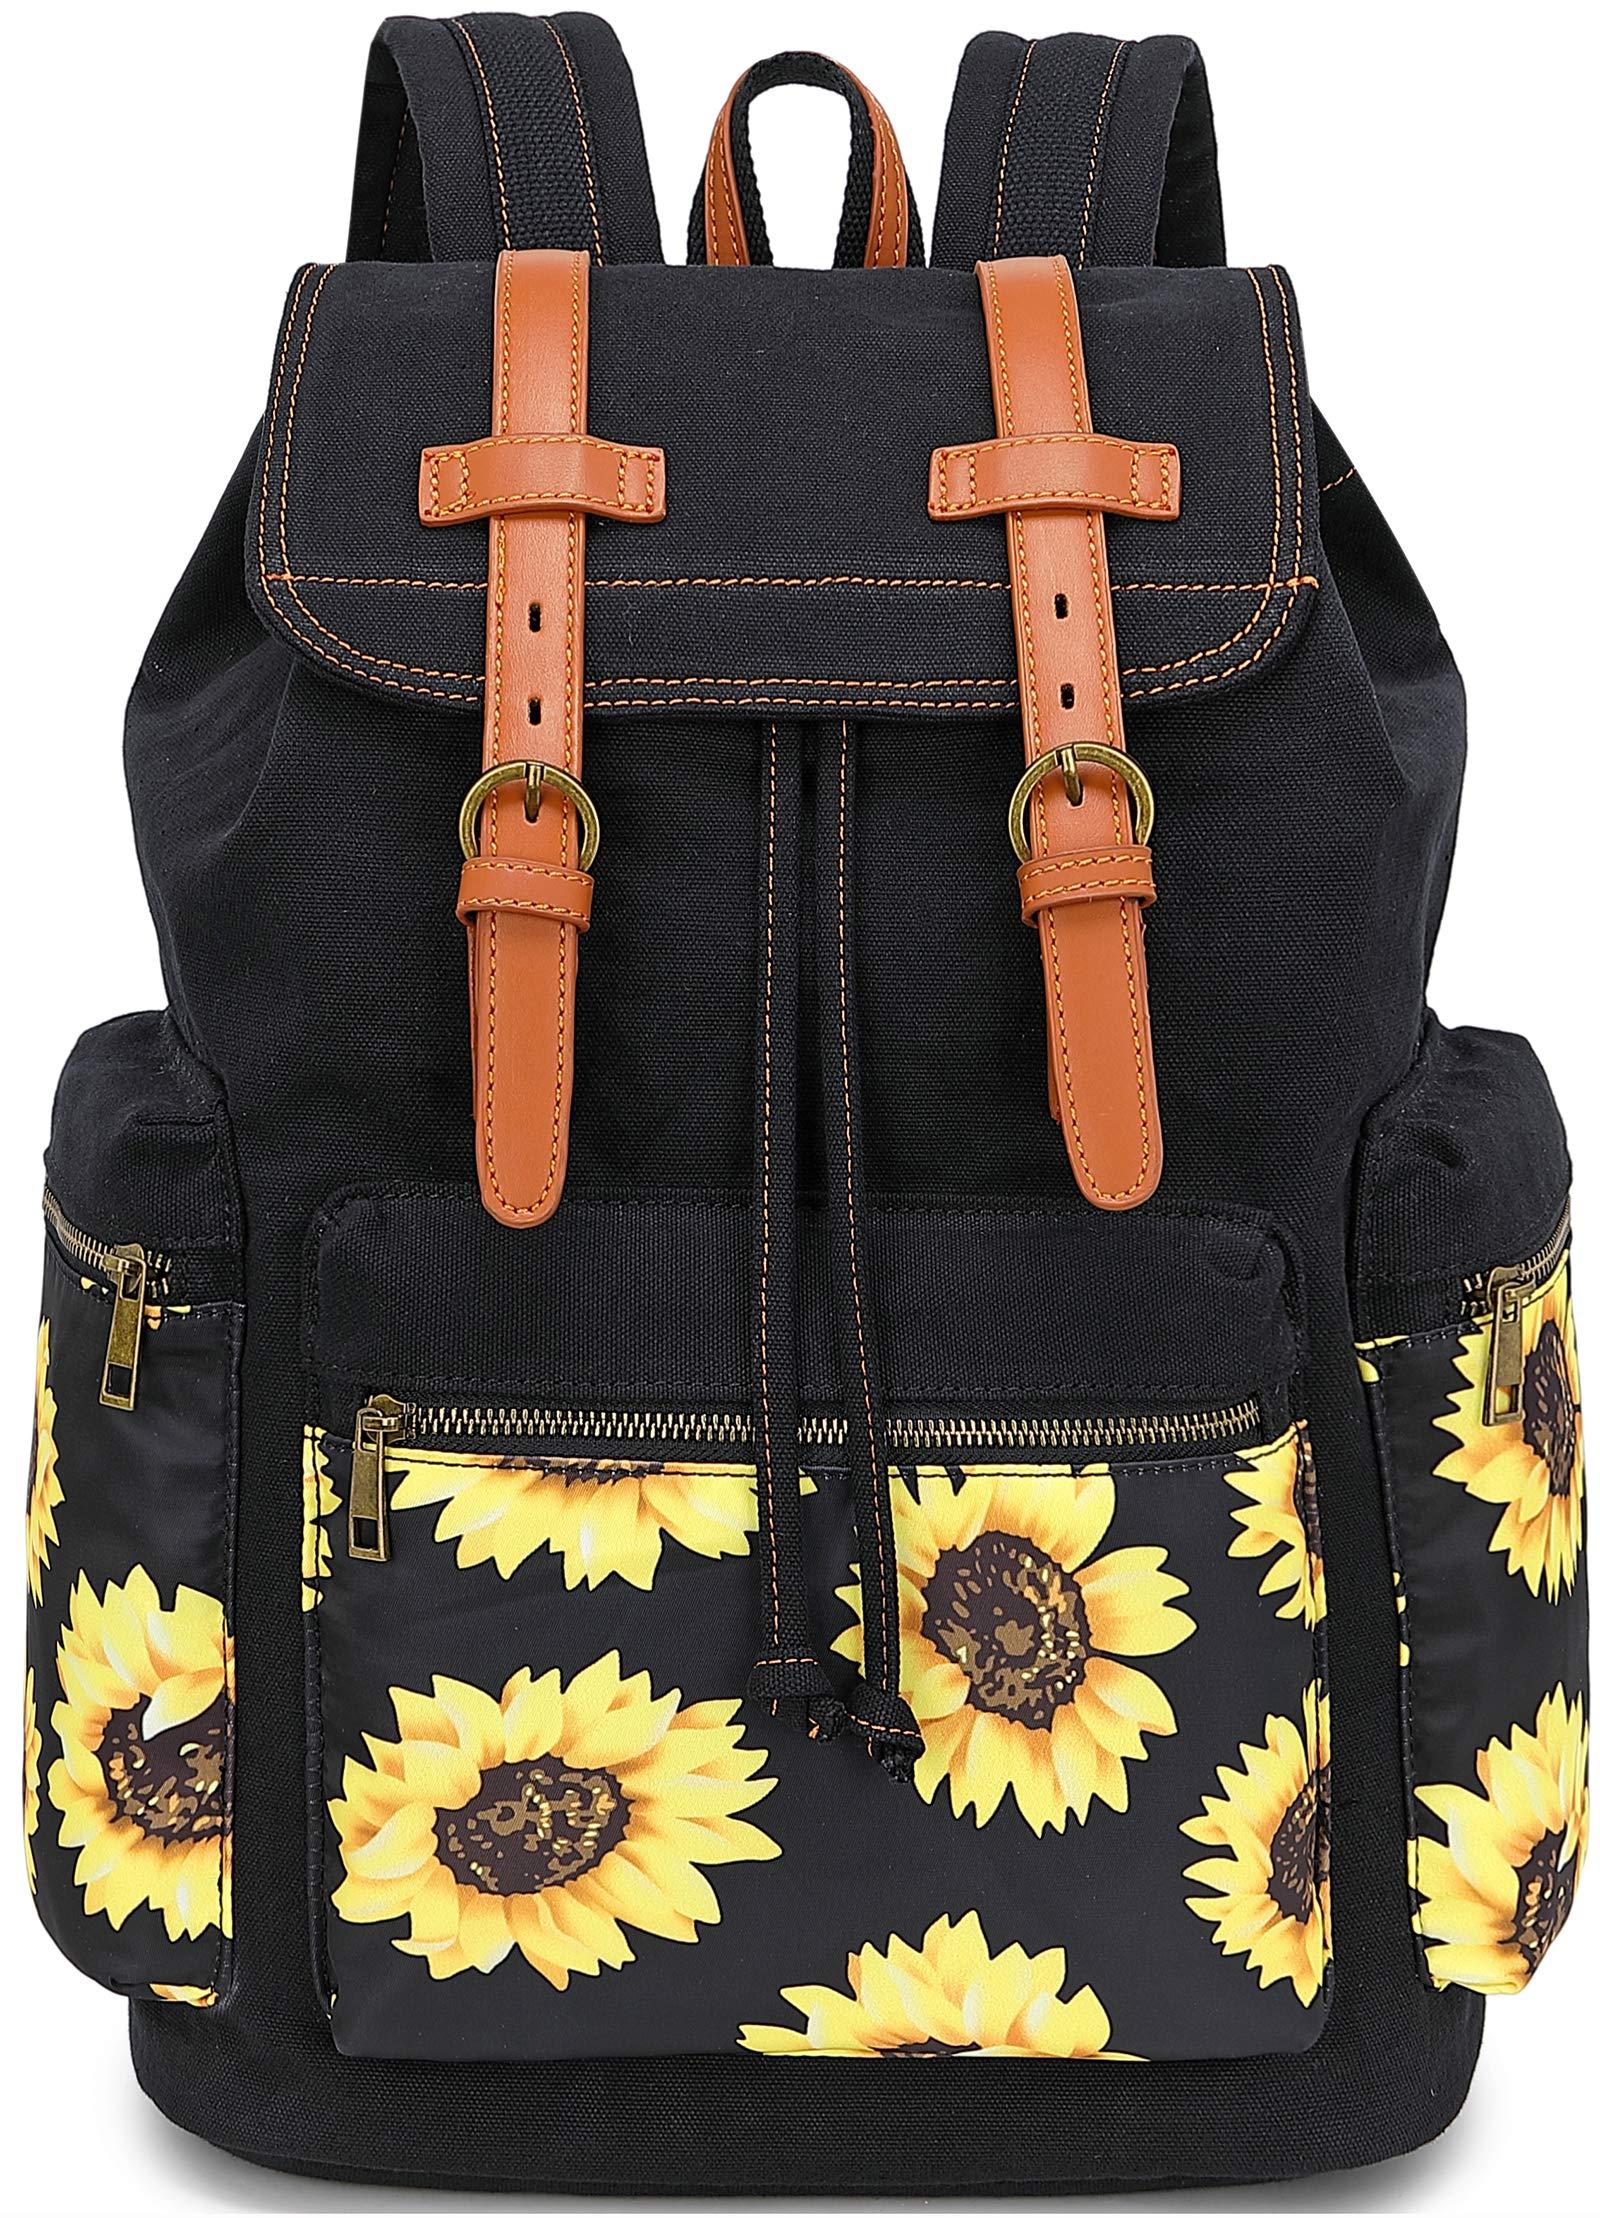 Girls School Backpack Women College Bookbag Lady Travel Rucksack 15.6Inch Laptop Bag (Black Sunflower) by BLUBOON